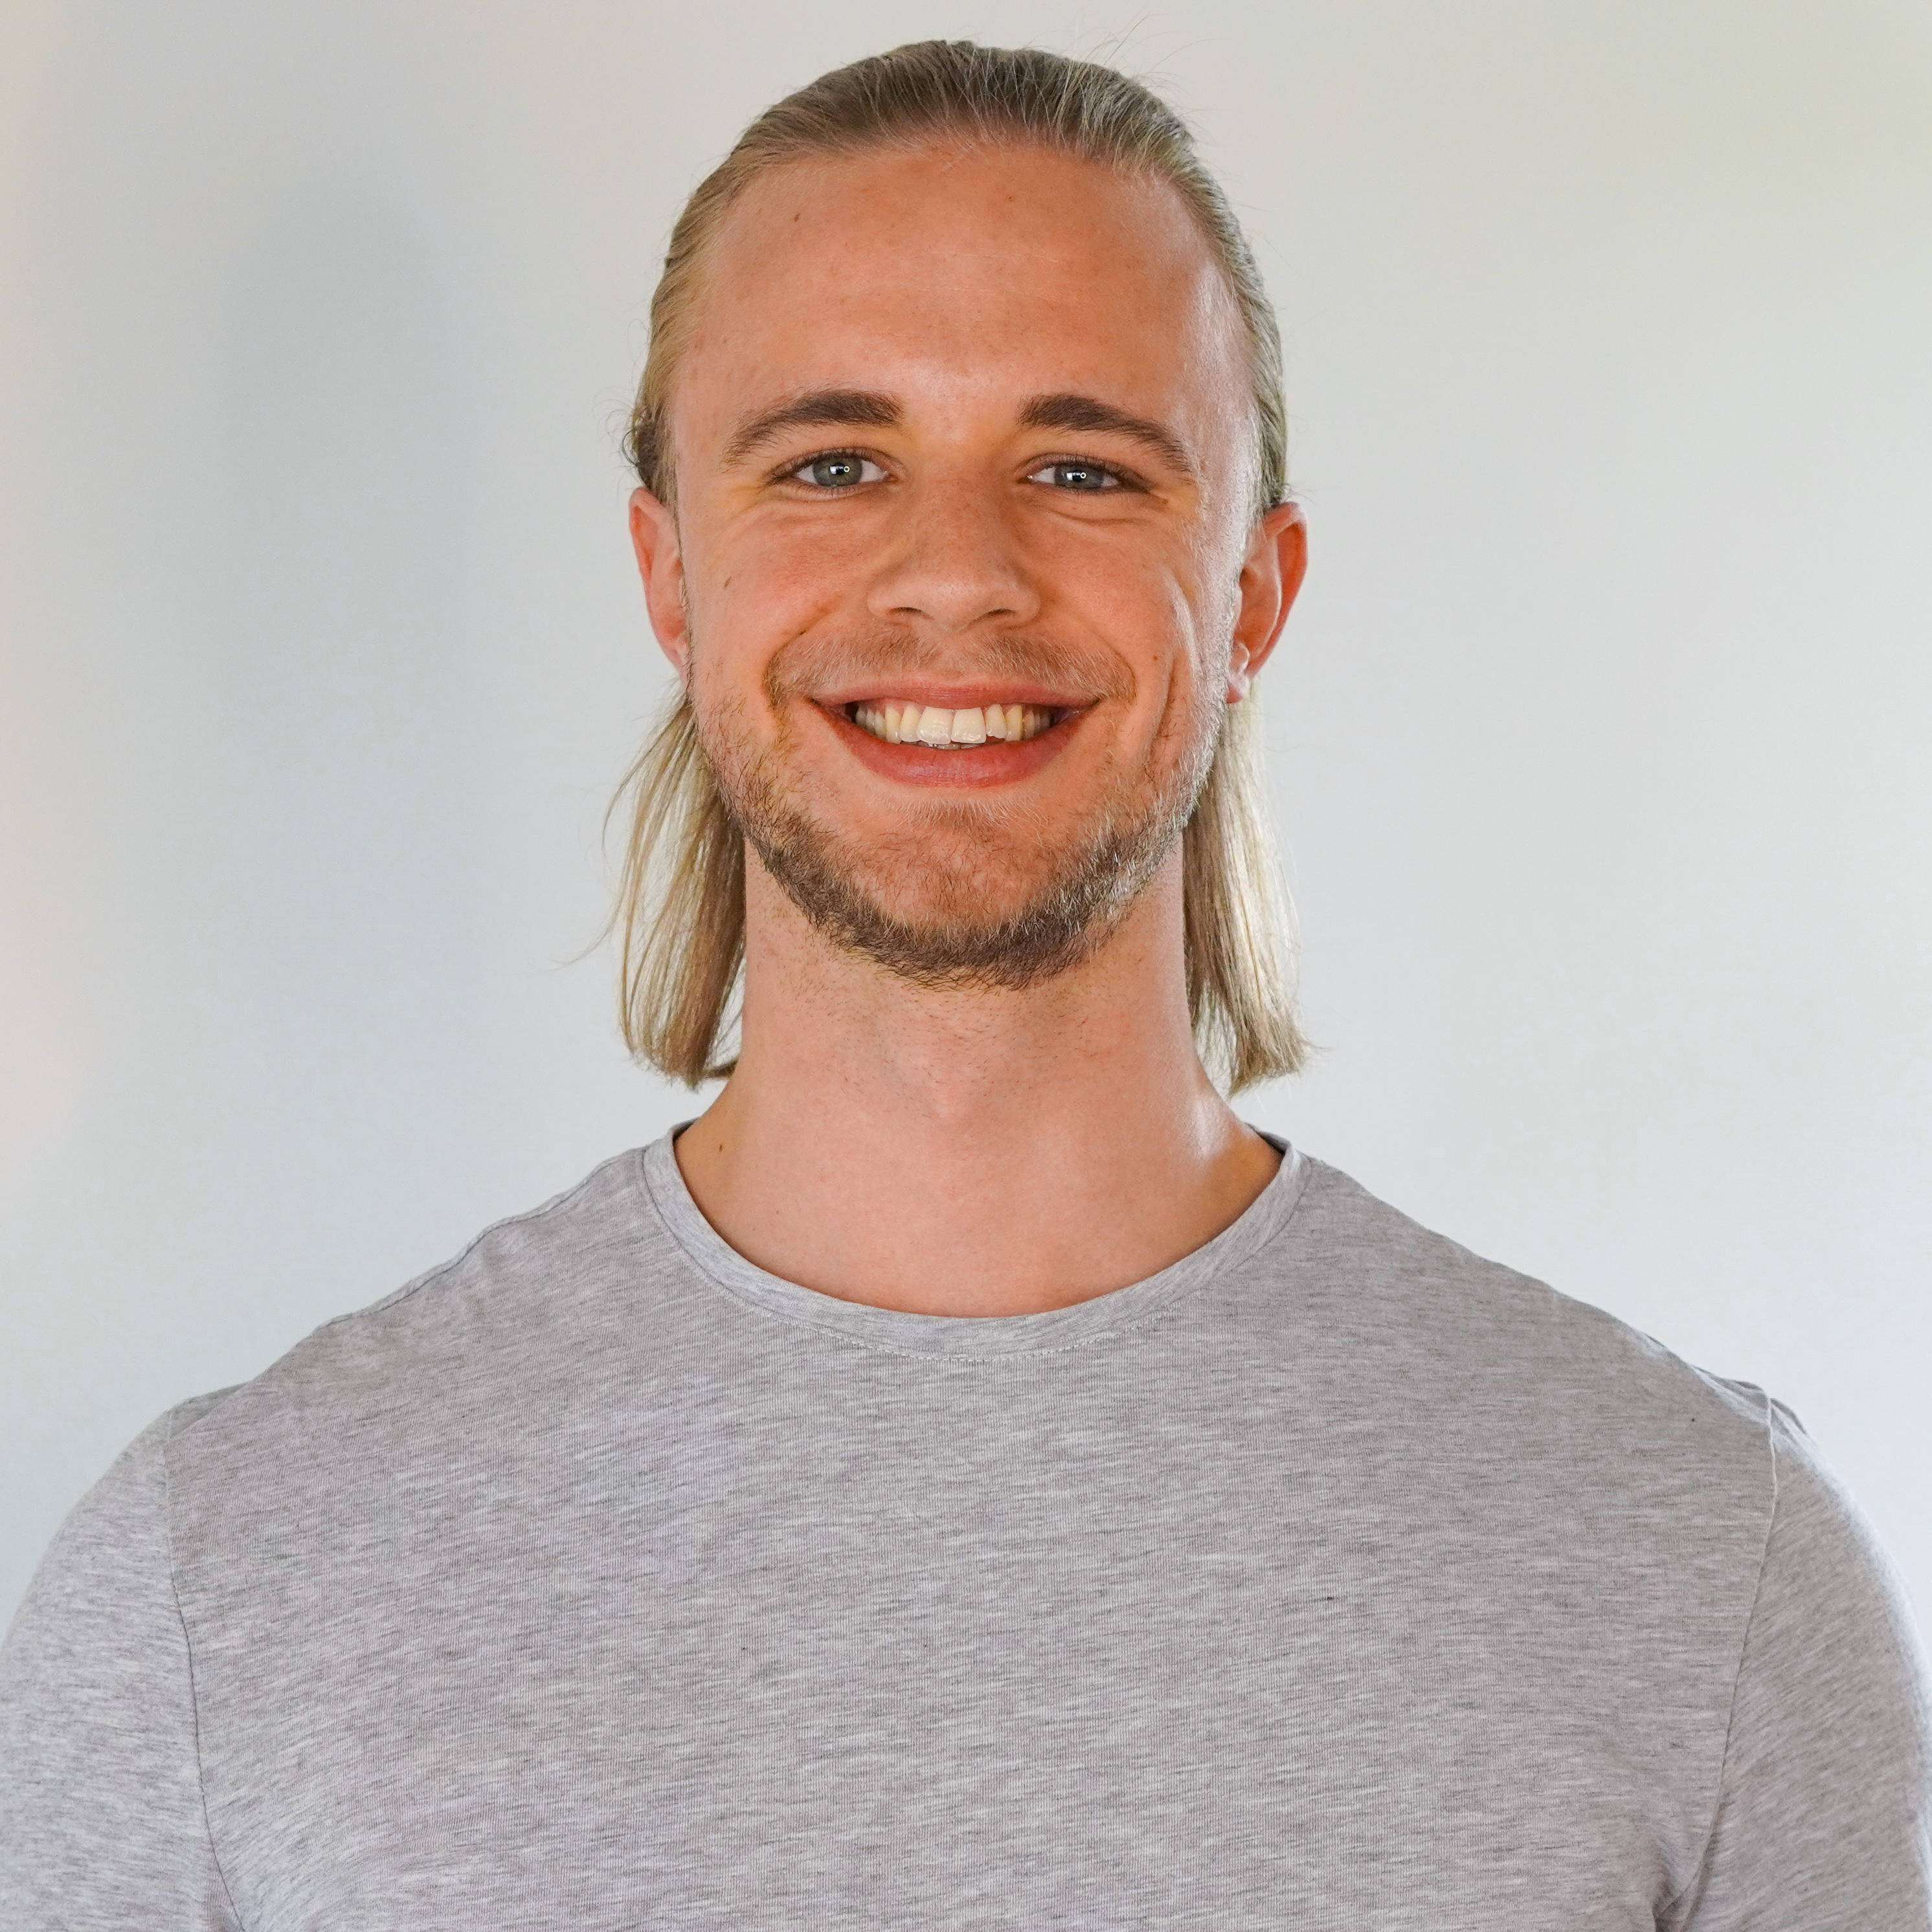 Lars Selck